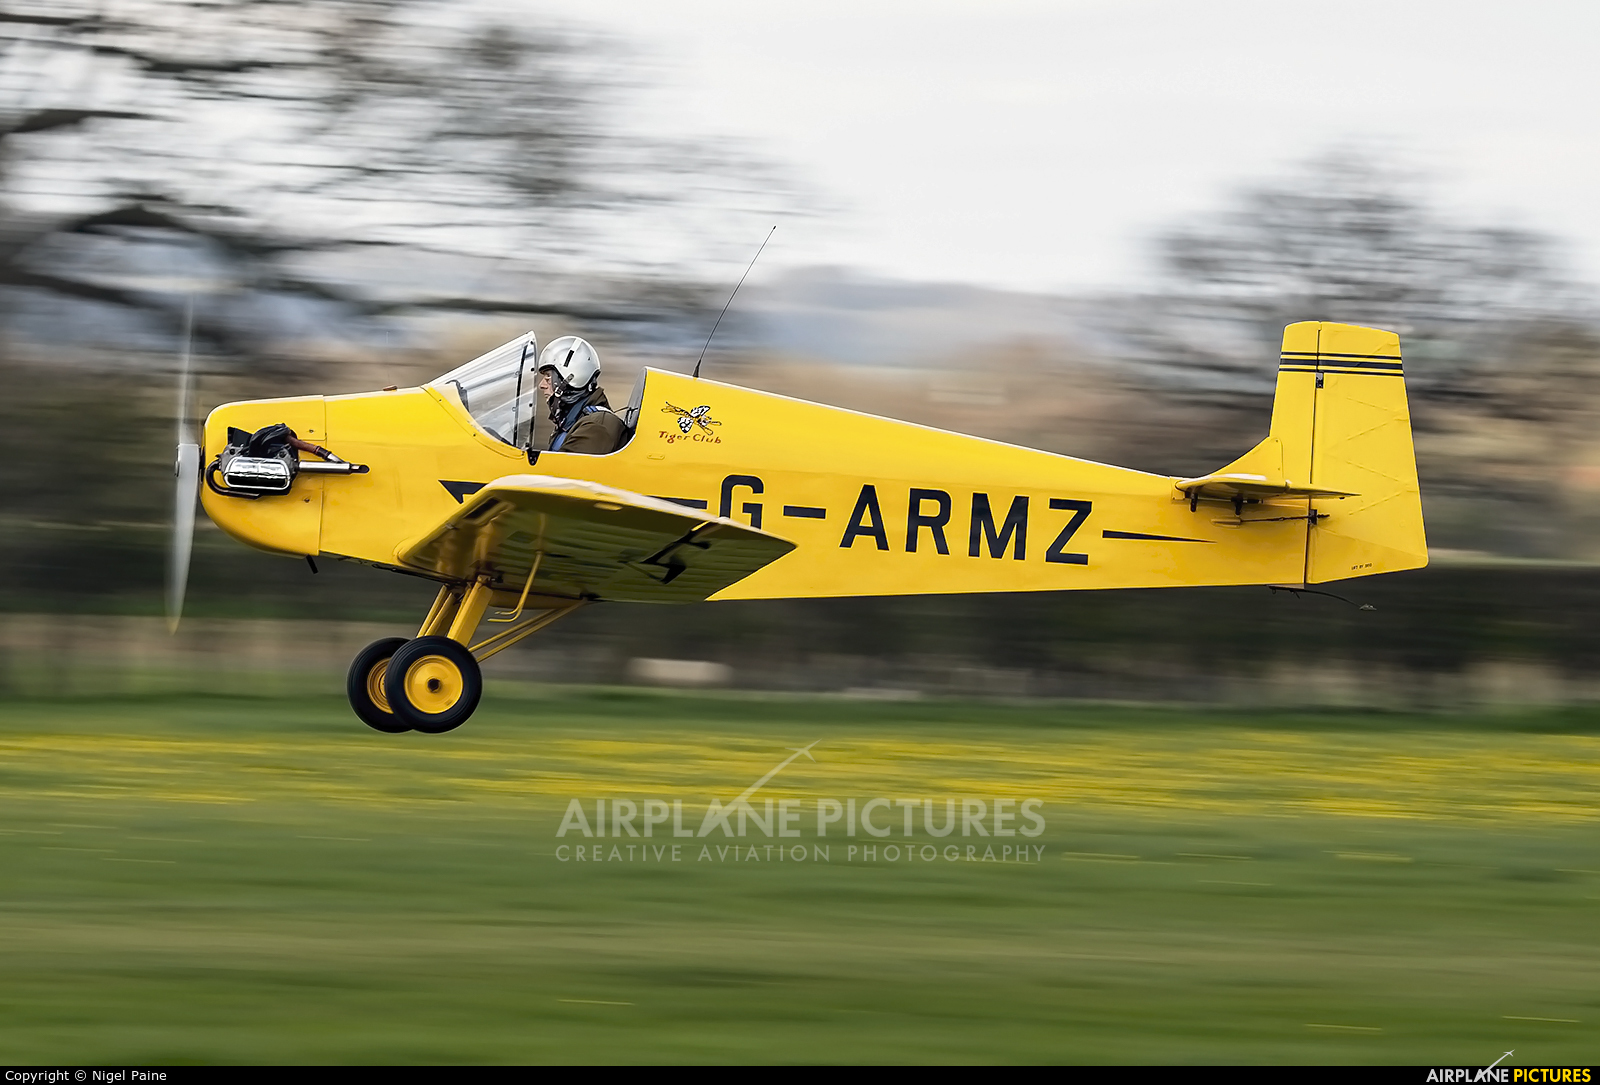 The Tiger Club G-ARMZ aircraft at Lashenden / Headcorn